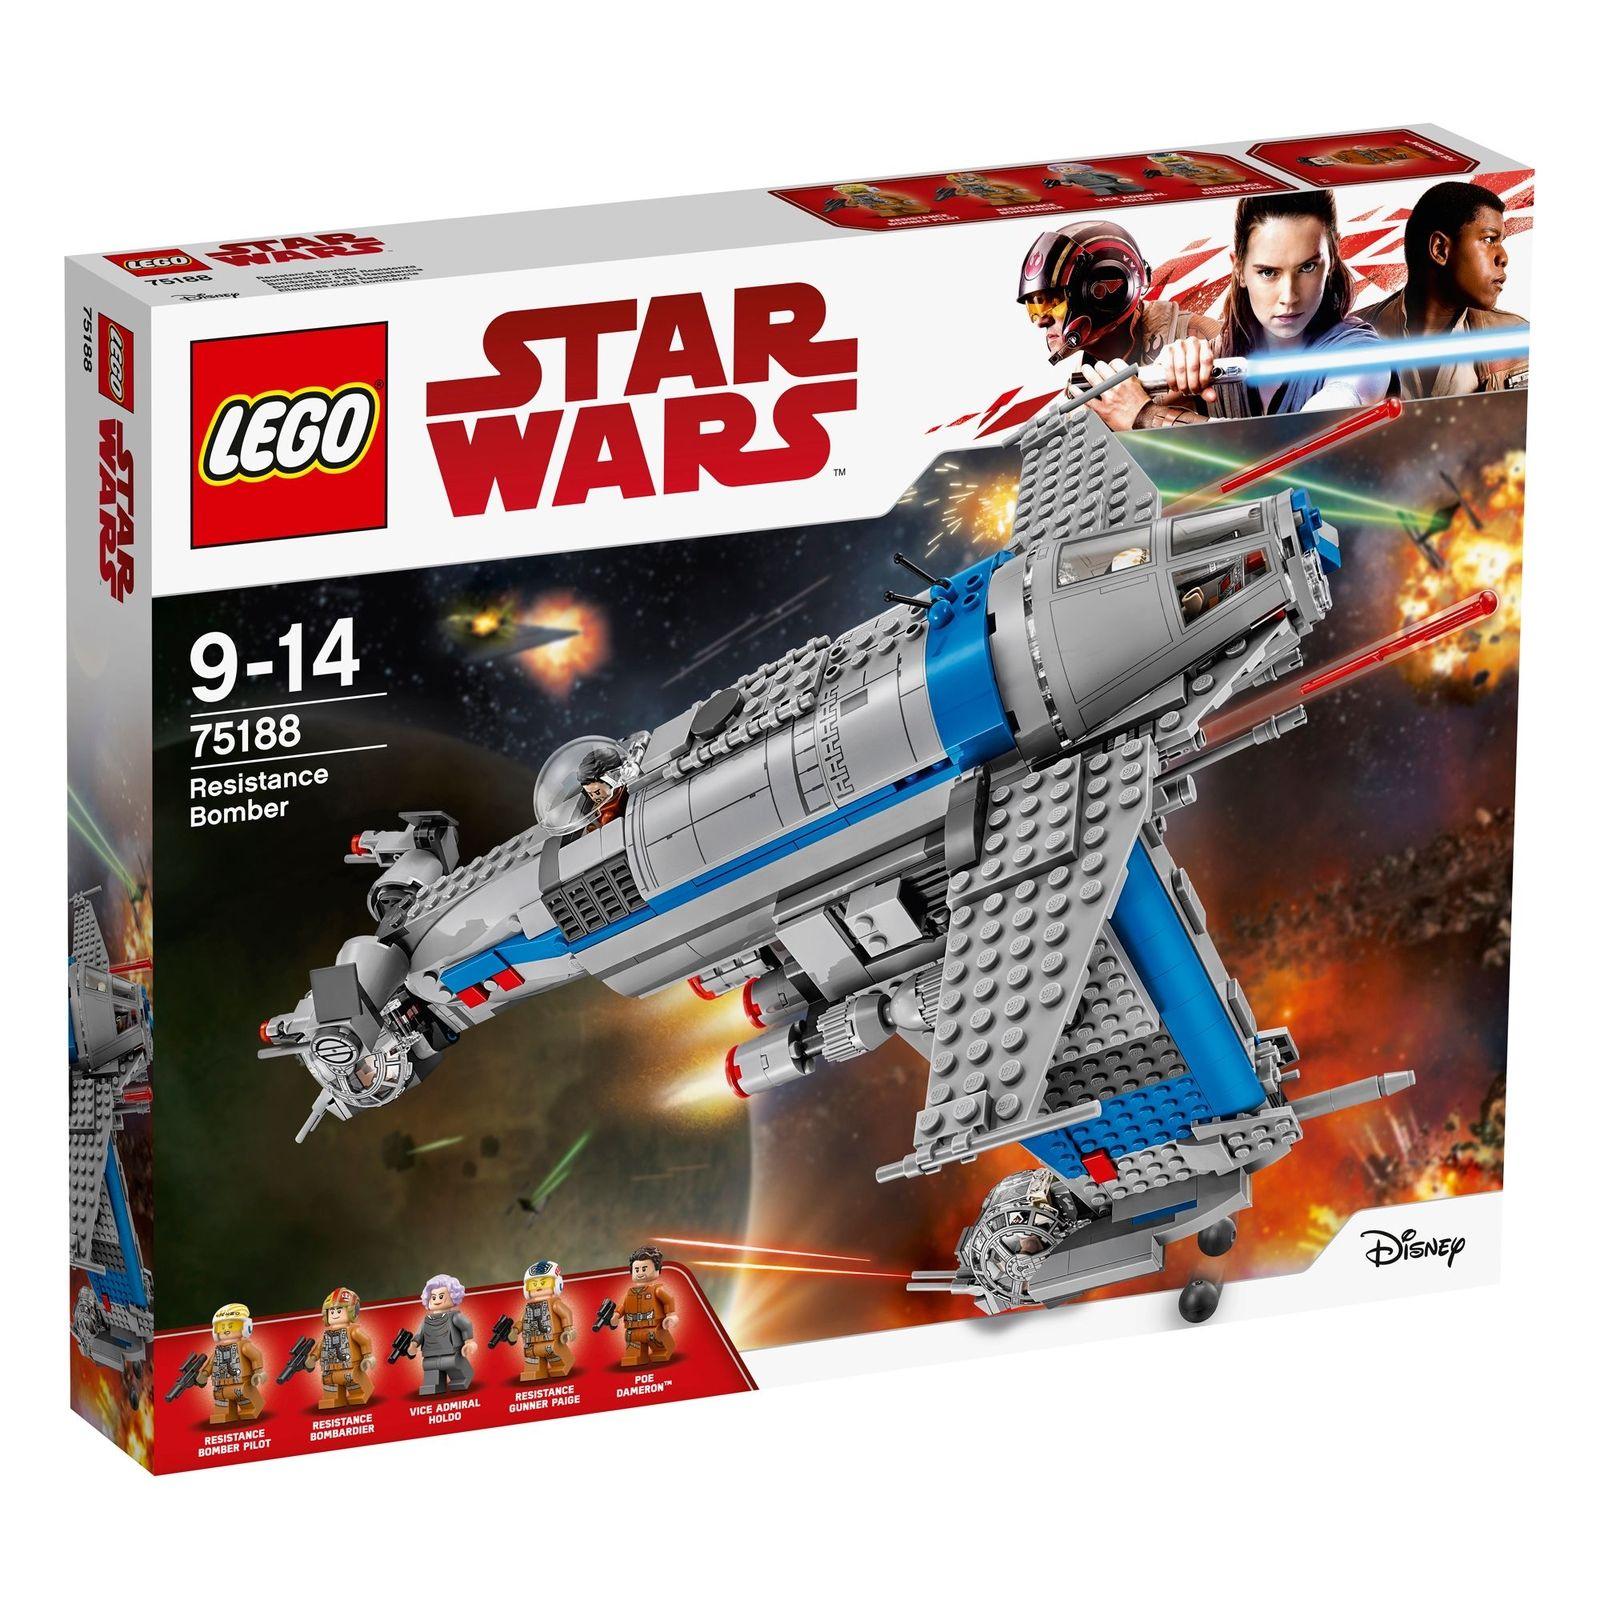 Lego Resistance Bomber - 75188 From Debenhams / Ebay £70.00 Delivered